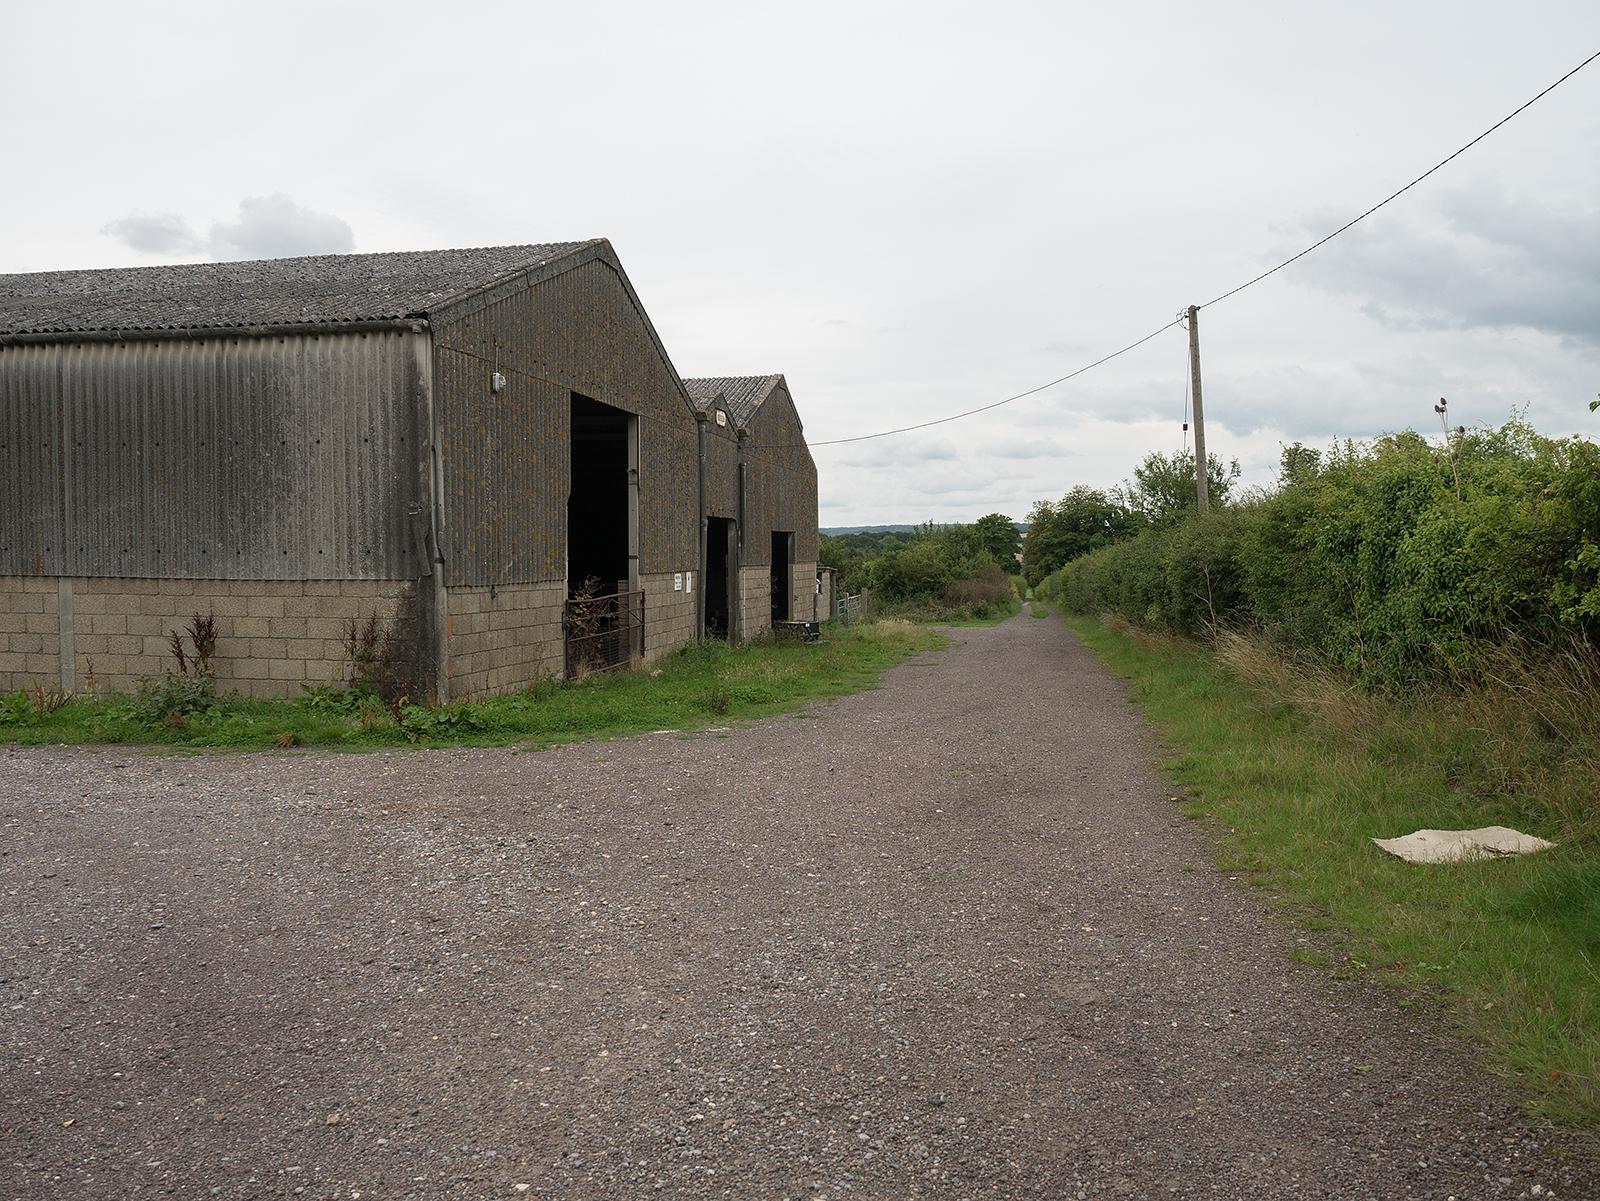 Passing beside Cranford Barn, back down towards the river